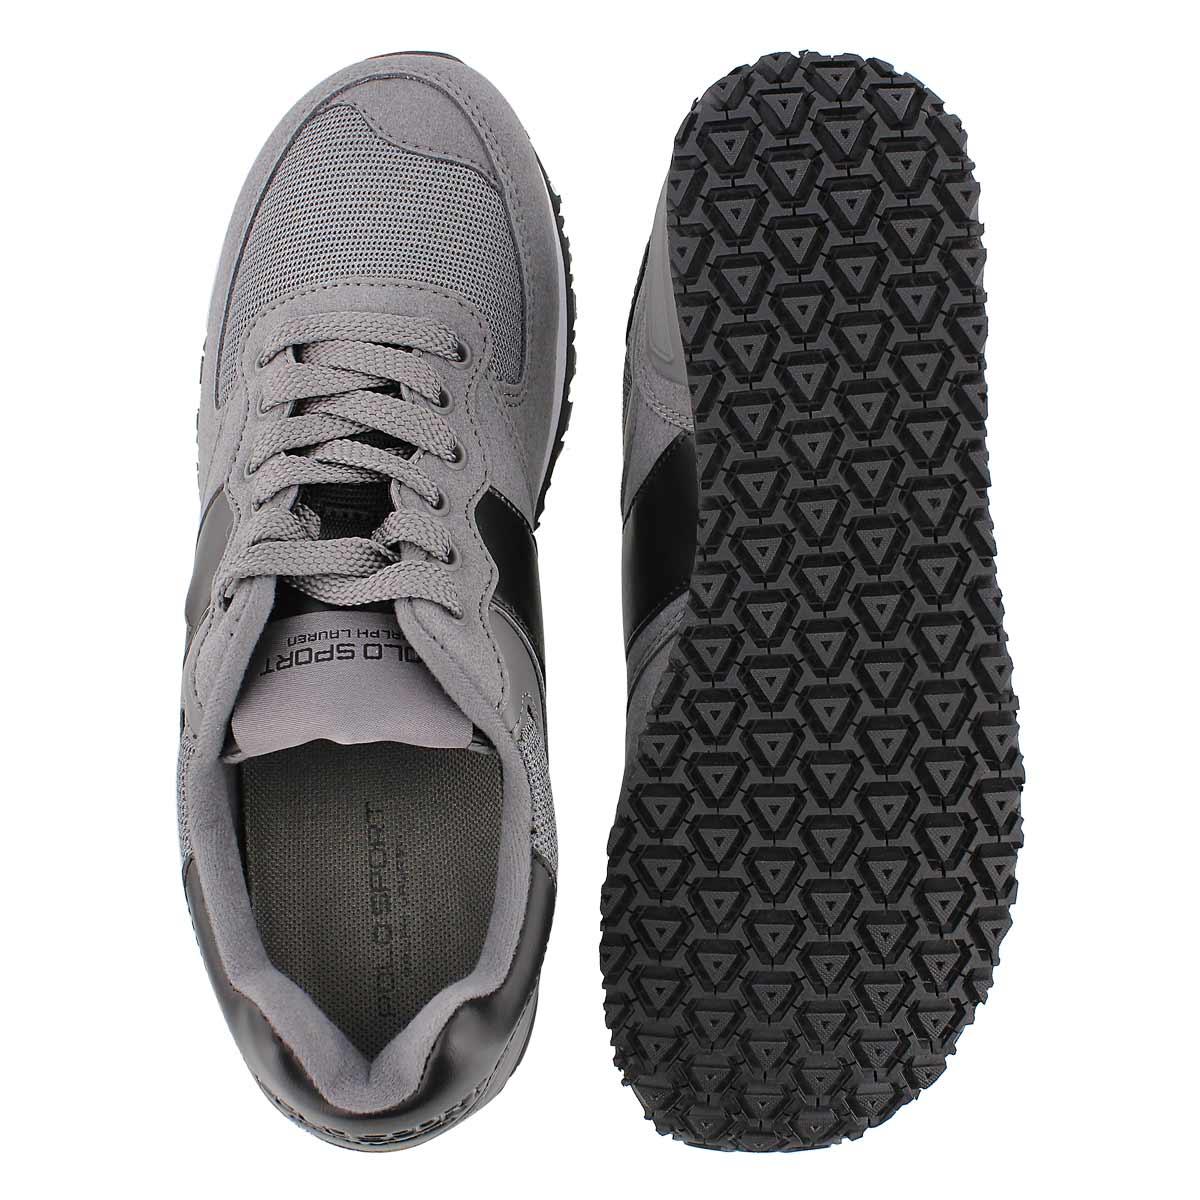 Mns Slaton Pony charcoal lace up sneaker